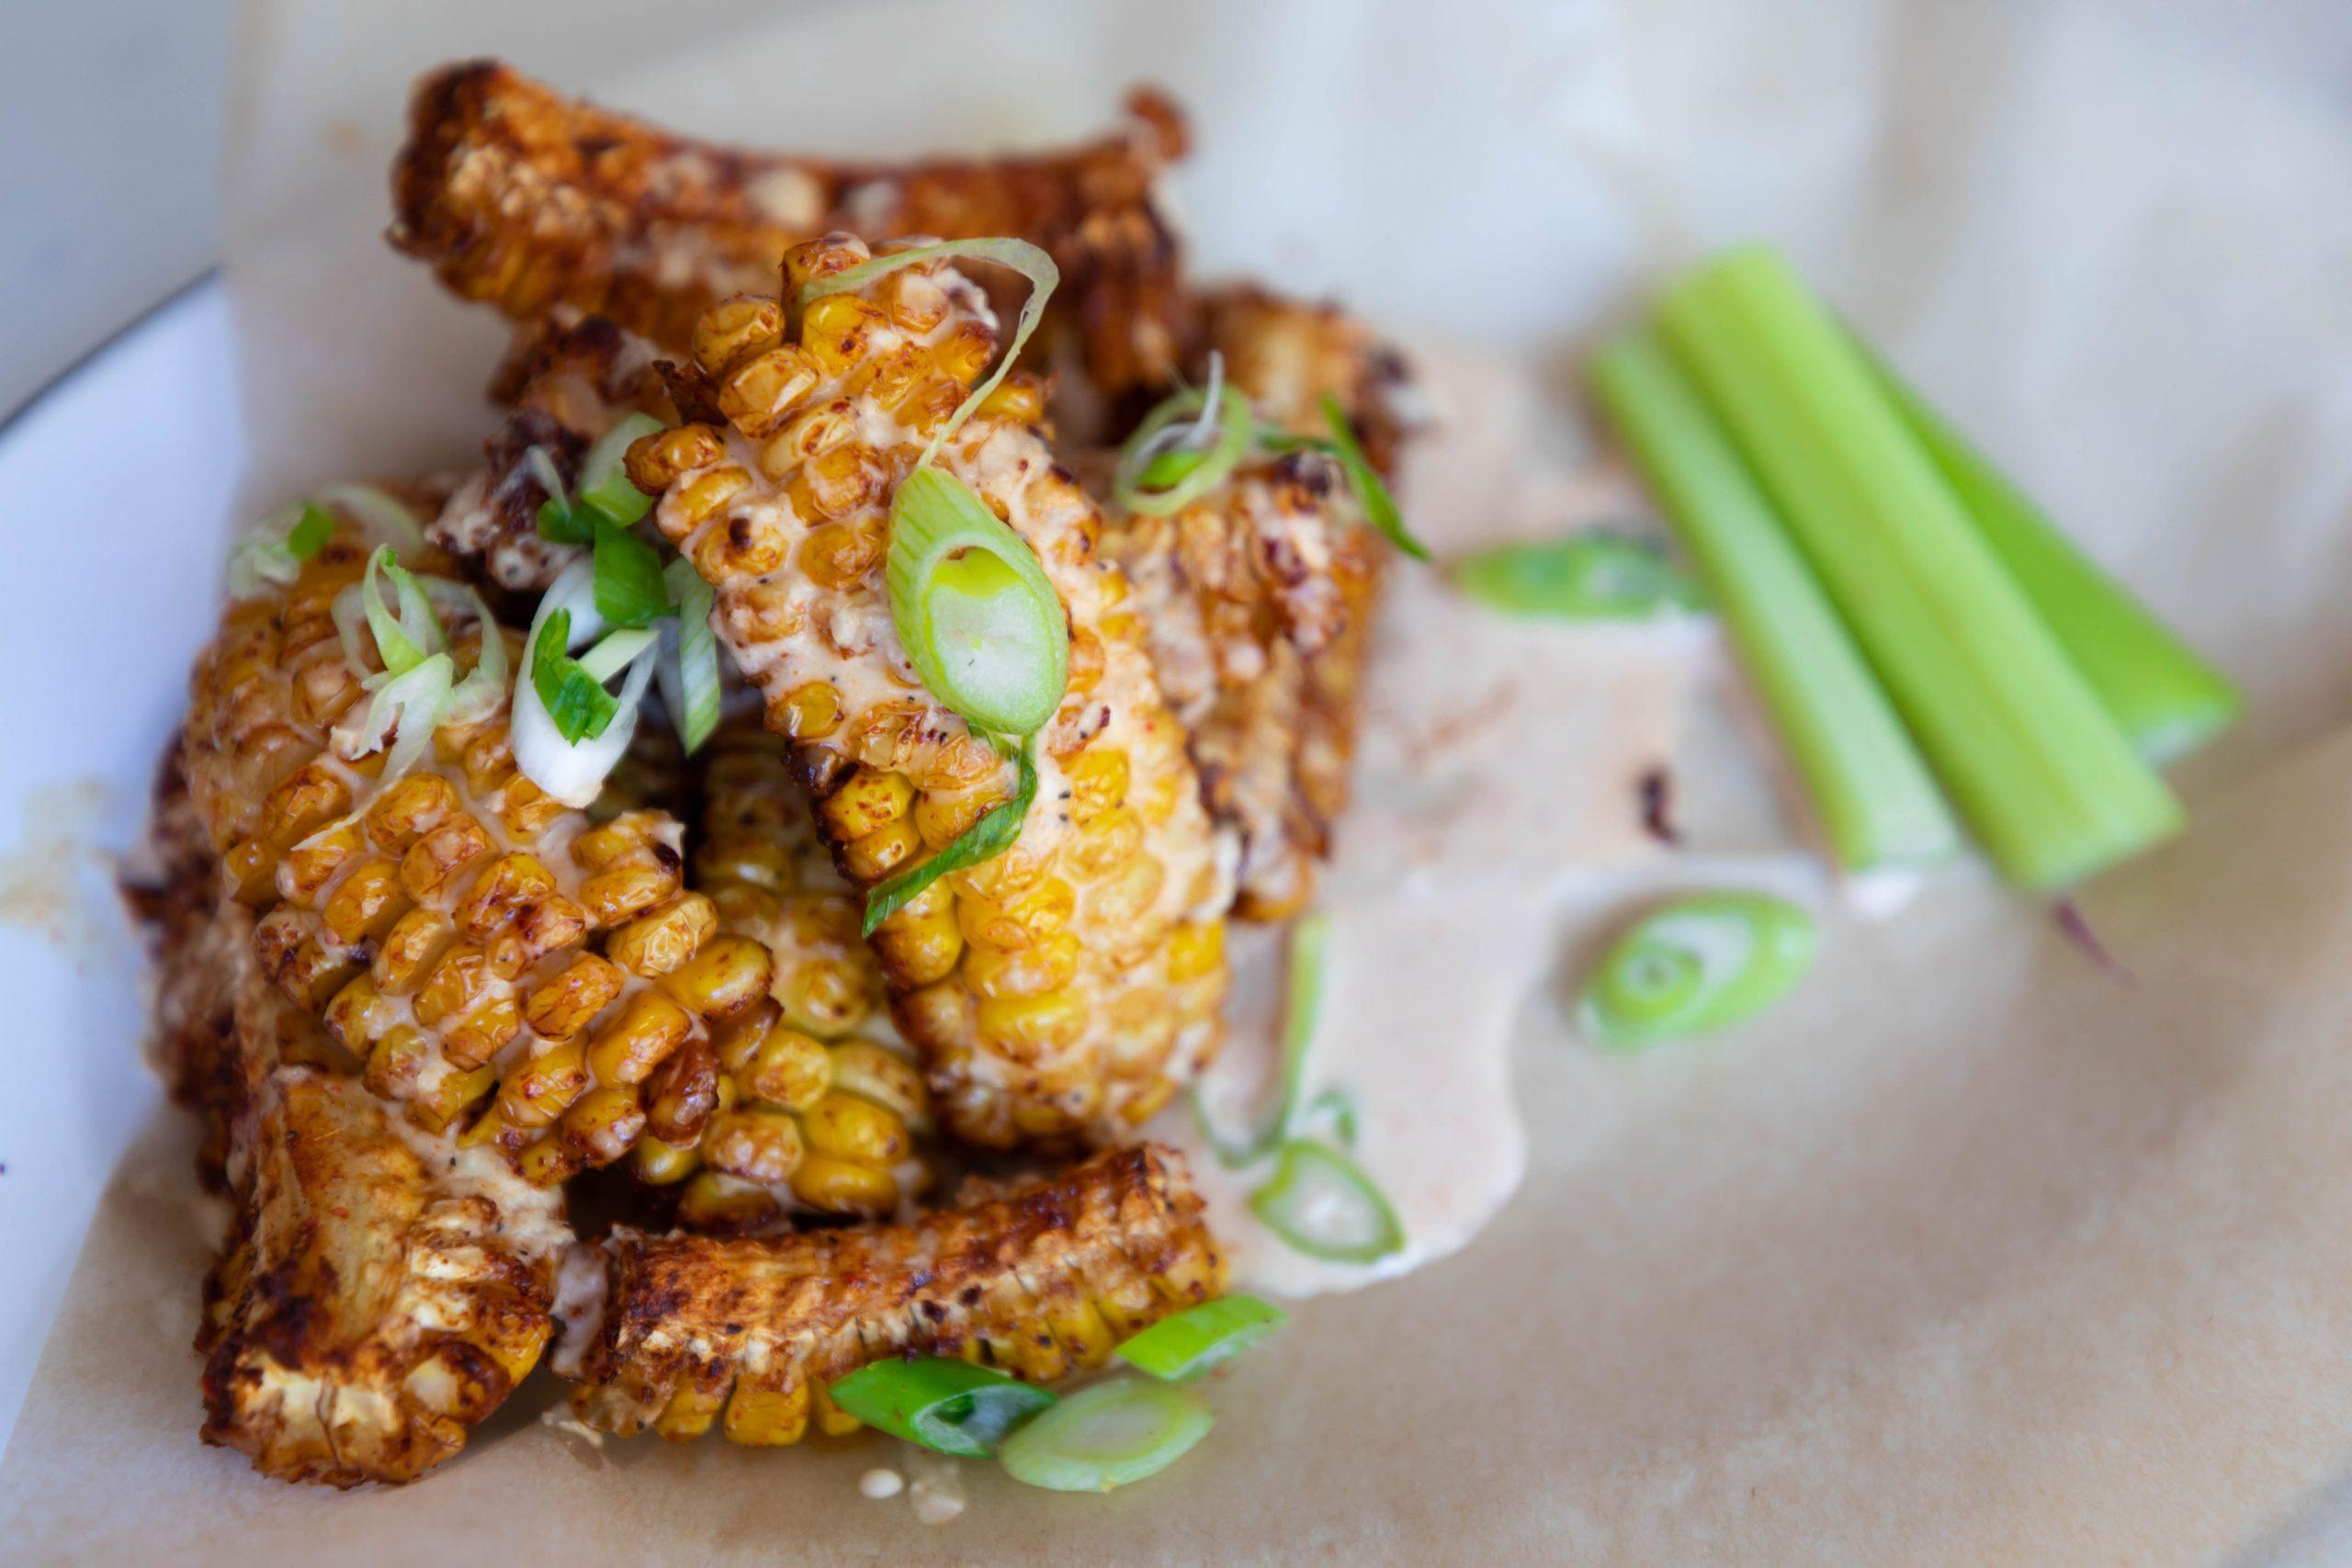 Vegan Corn Ribs at Basic Kitchen in Charleston South Carolina Plant Based Seasonal Local Cuisine Photographed by Annie Fairfax